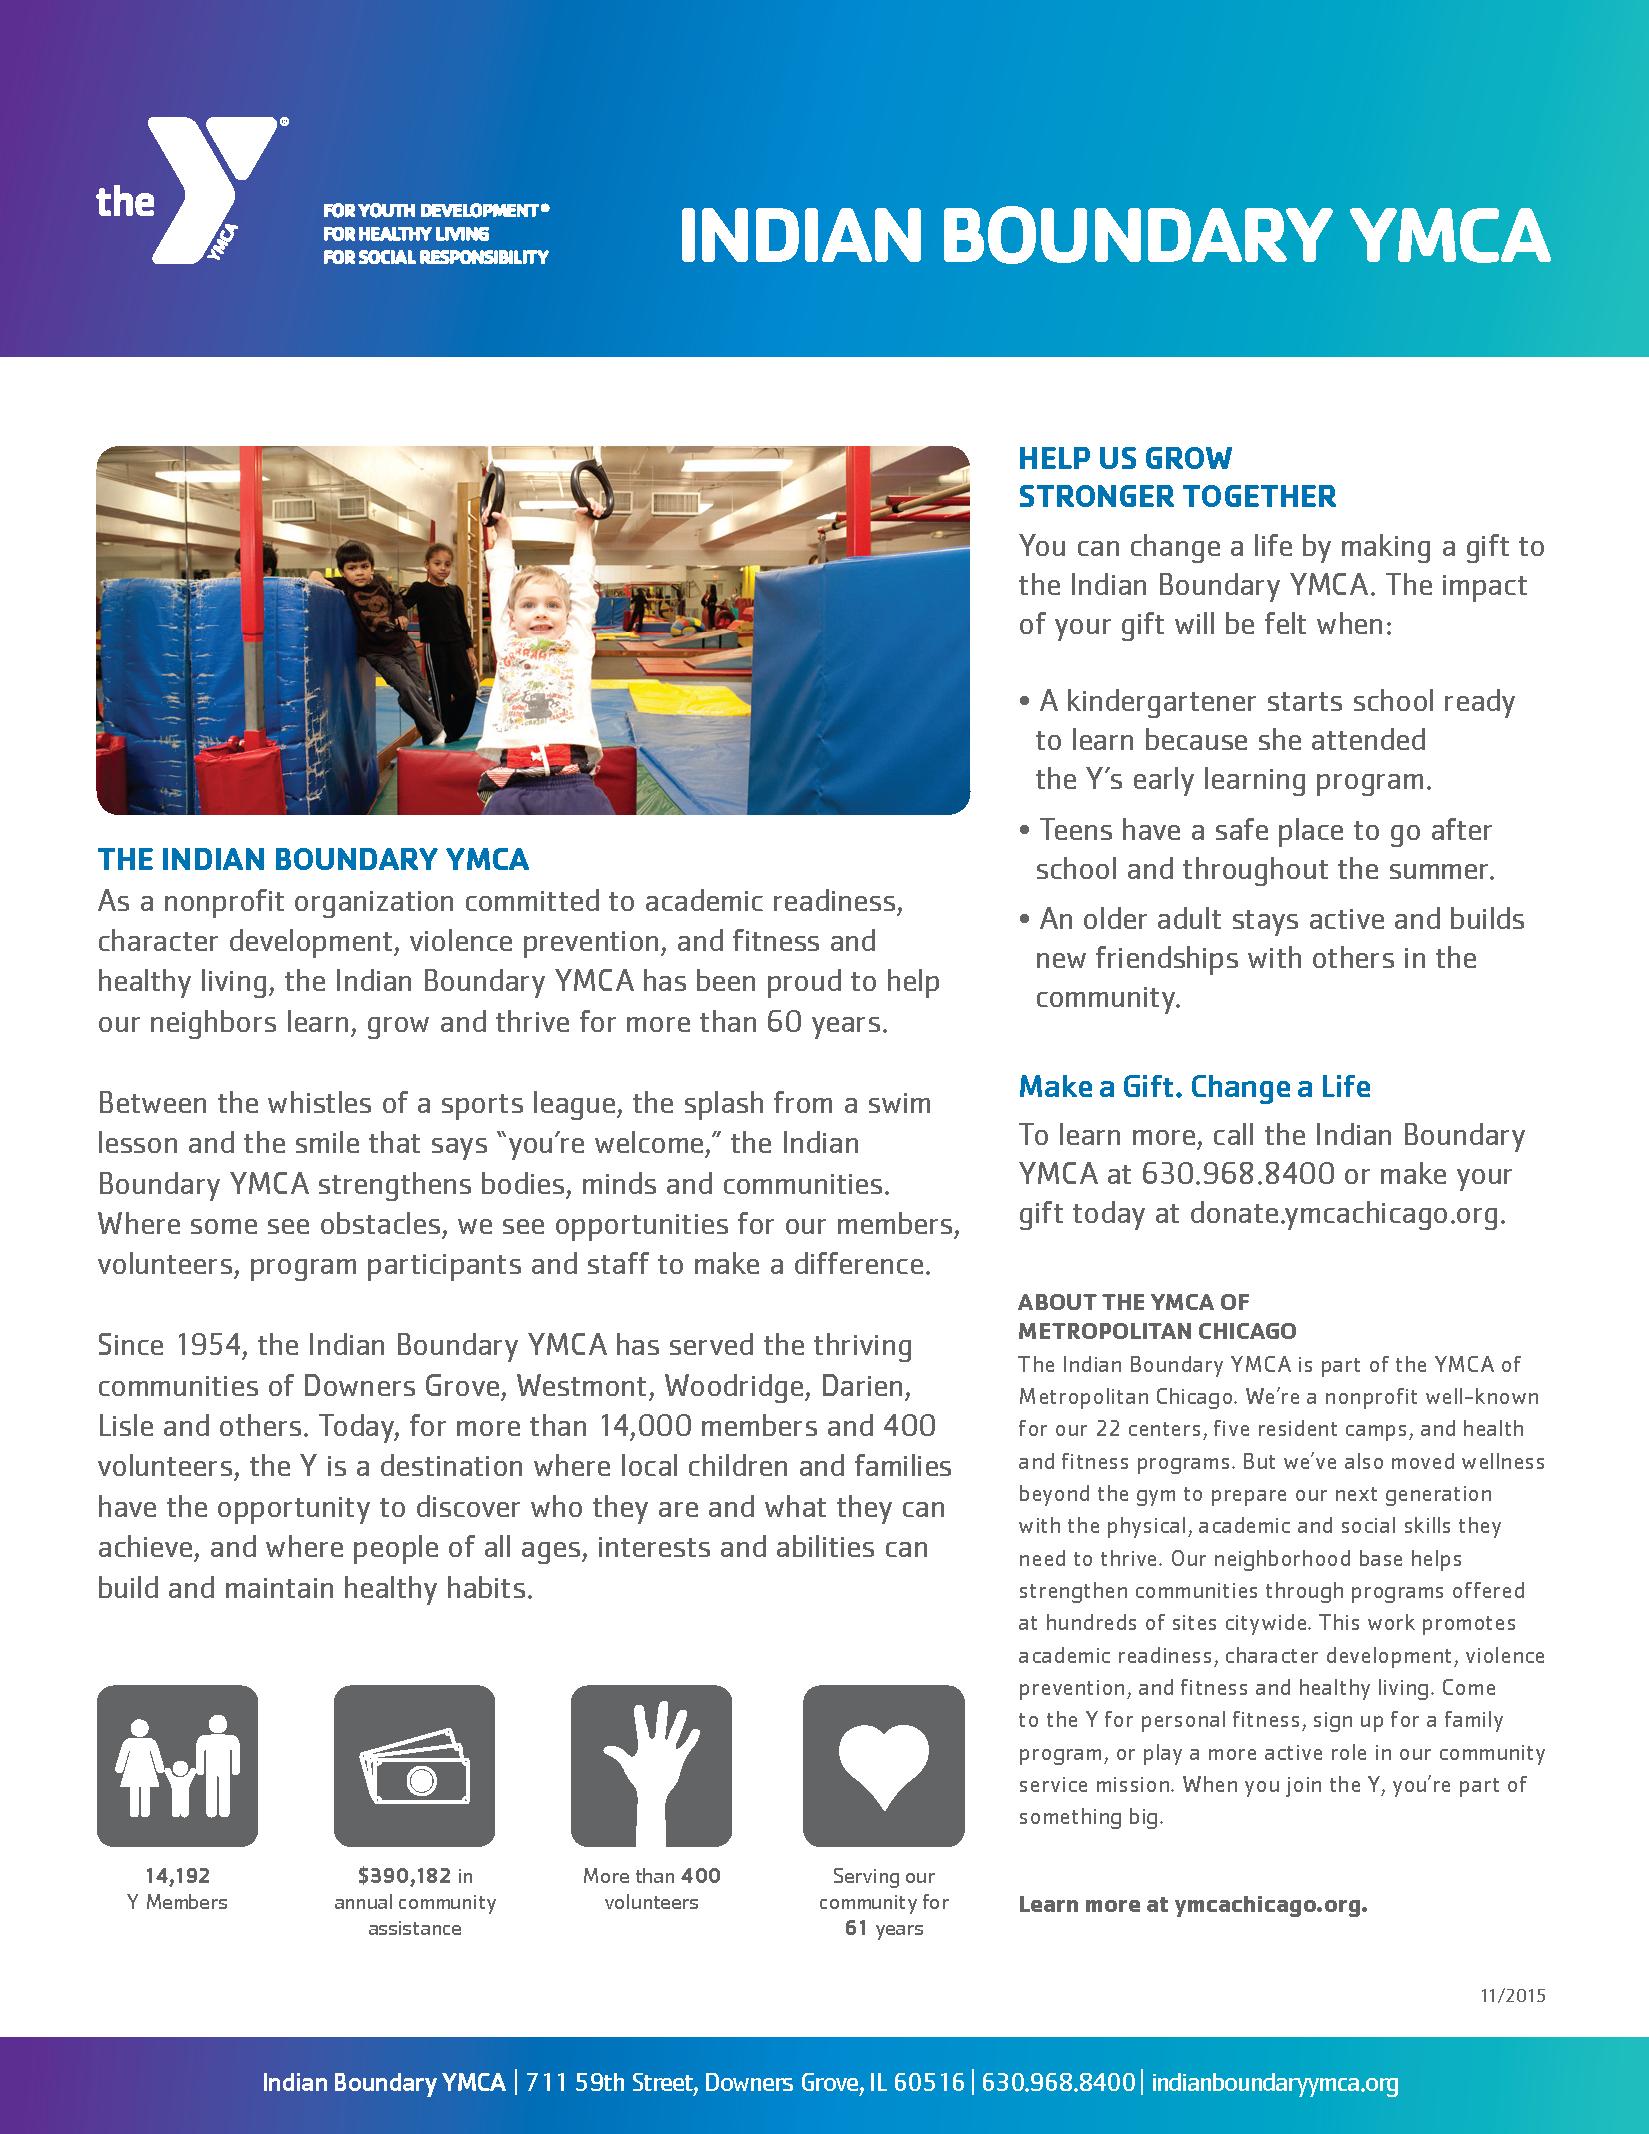 Indian Boundary YMCA one-sheet, side 2